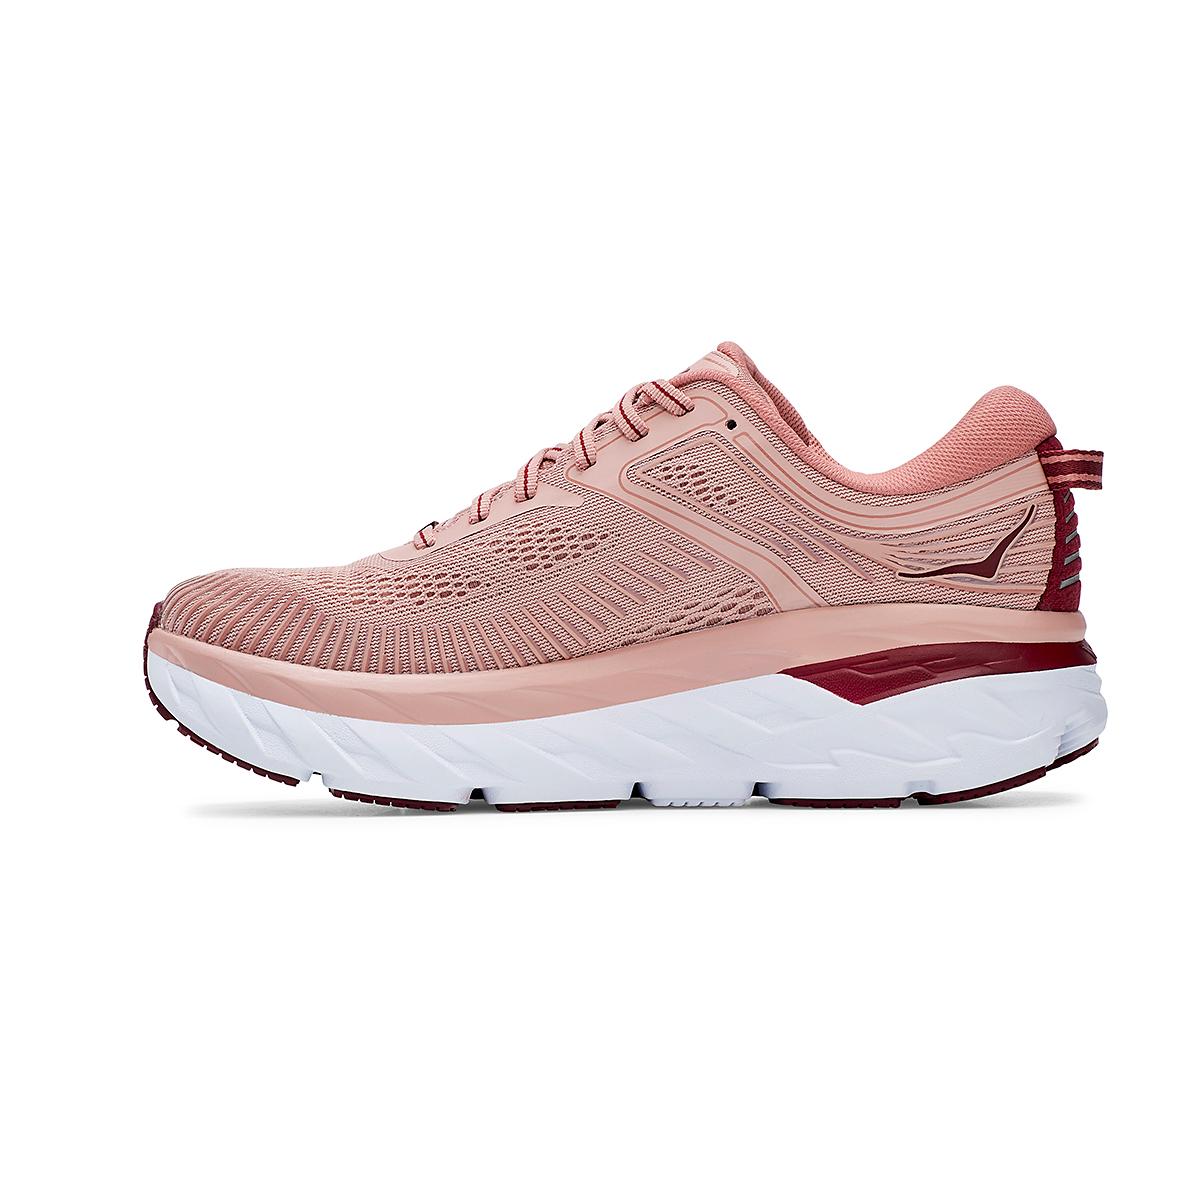 Women's Hoka One One Bondi 7 Running Shoe - Color: Misty Rose/Cordovan - Size: 5 - Width: Regular, Misty Rose/Cordovan, large, image 2